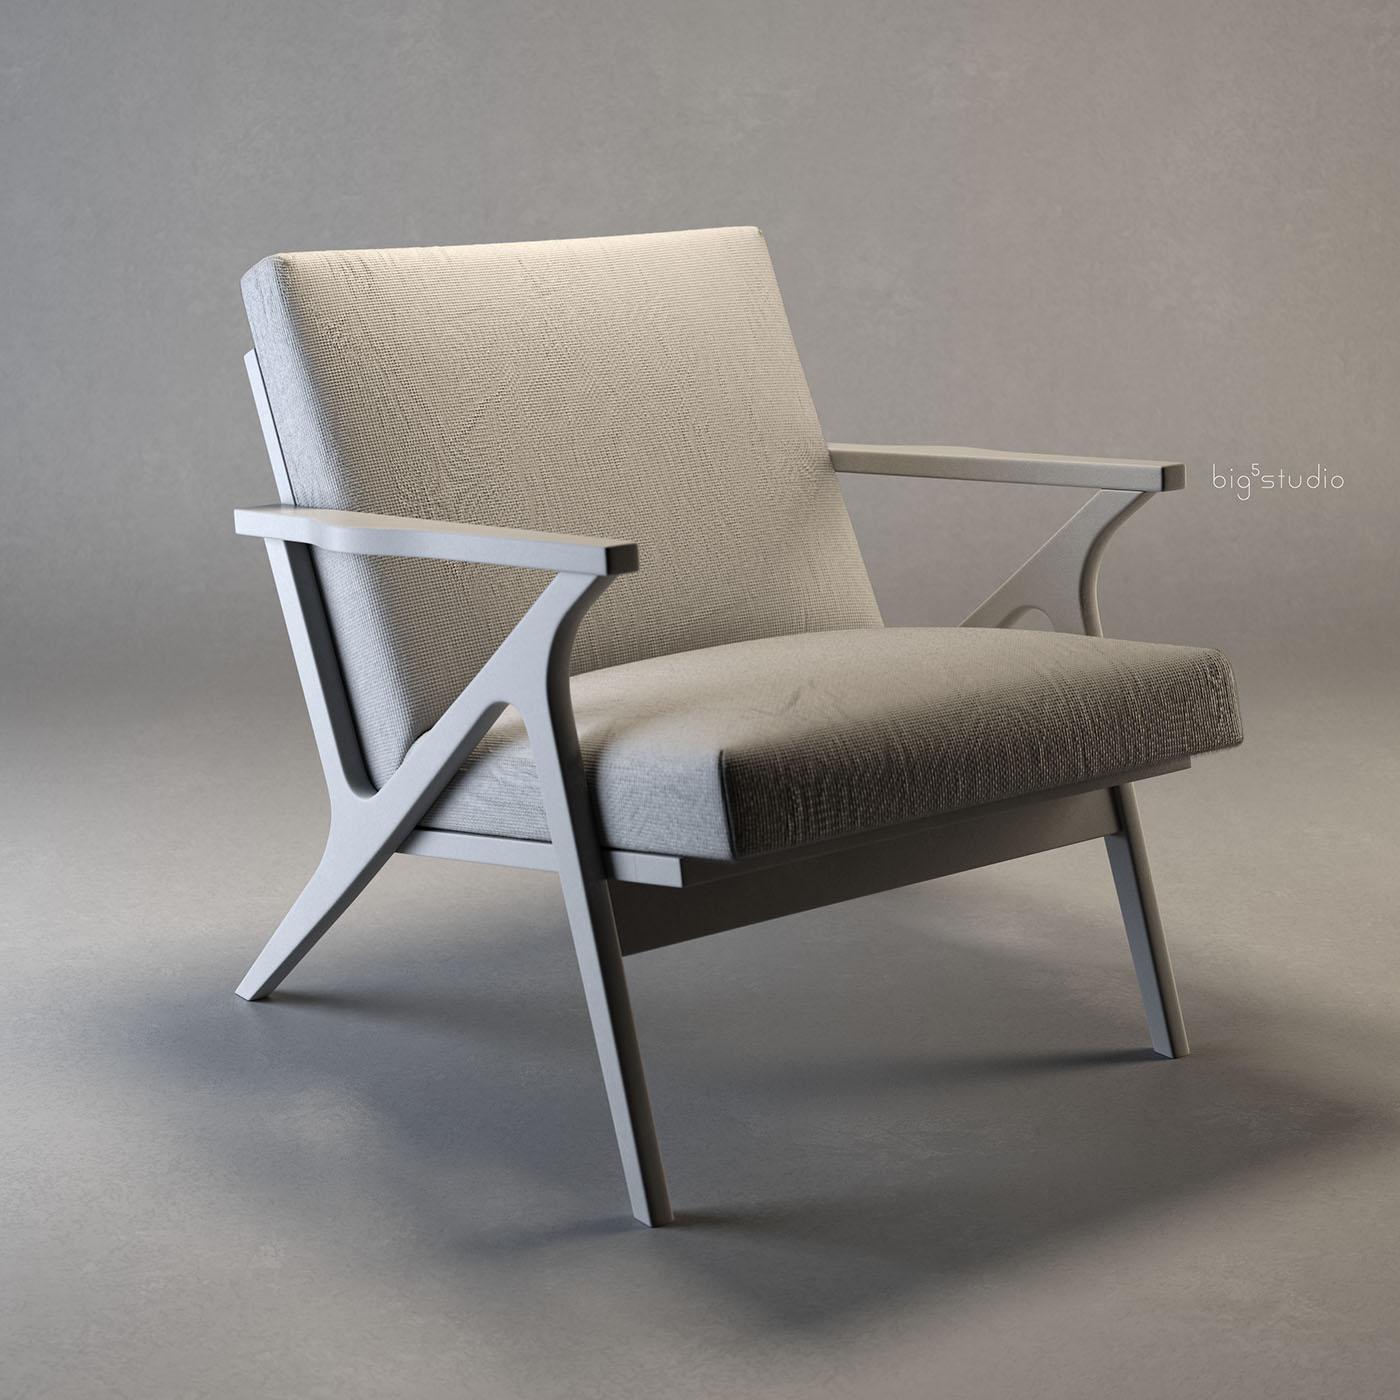 Charmant Cavett Wood Frame Chair On Behance